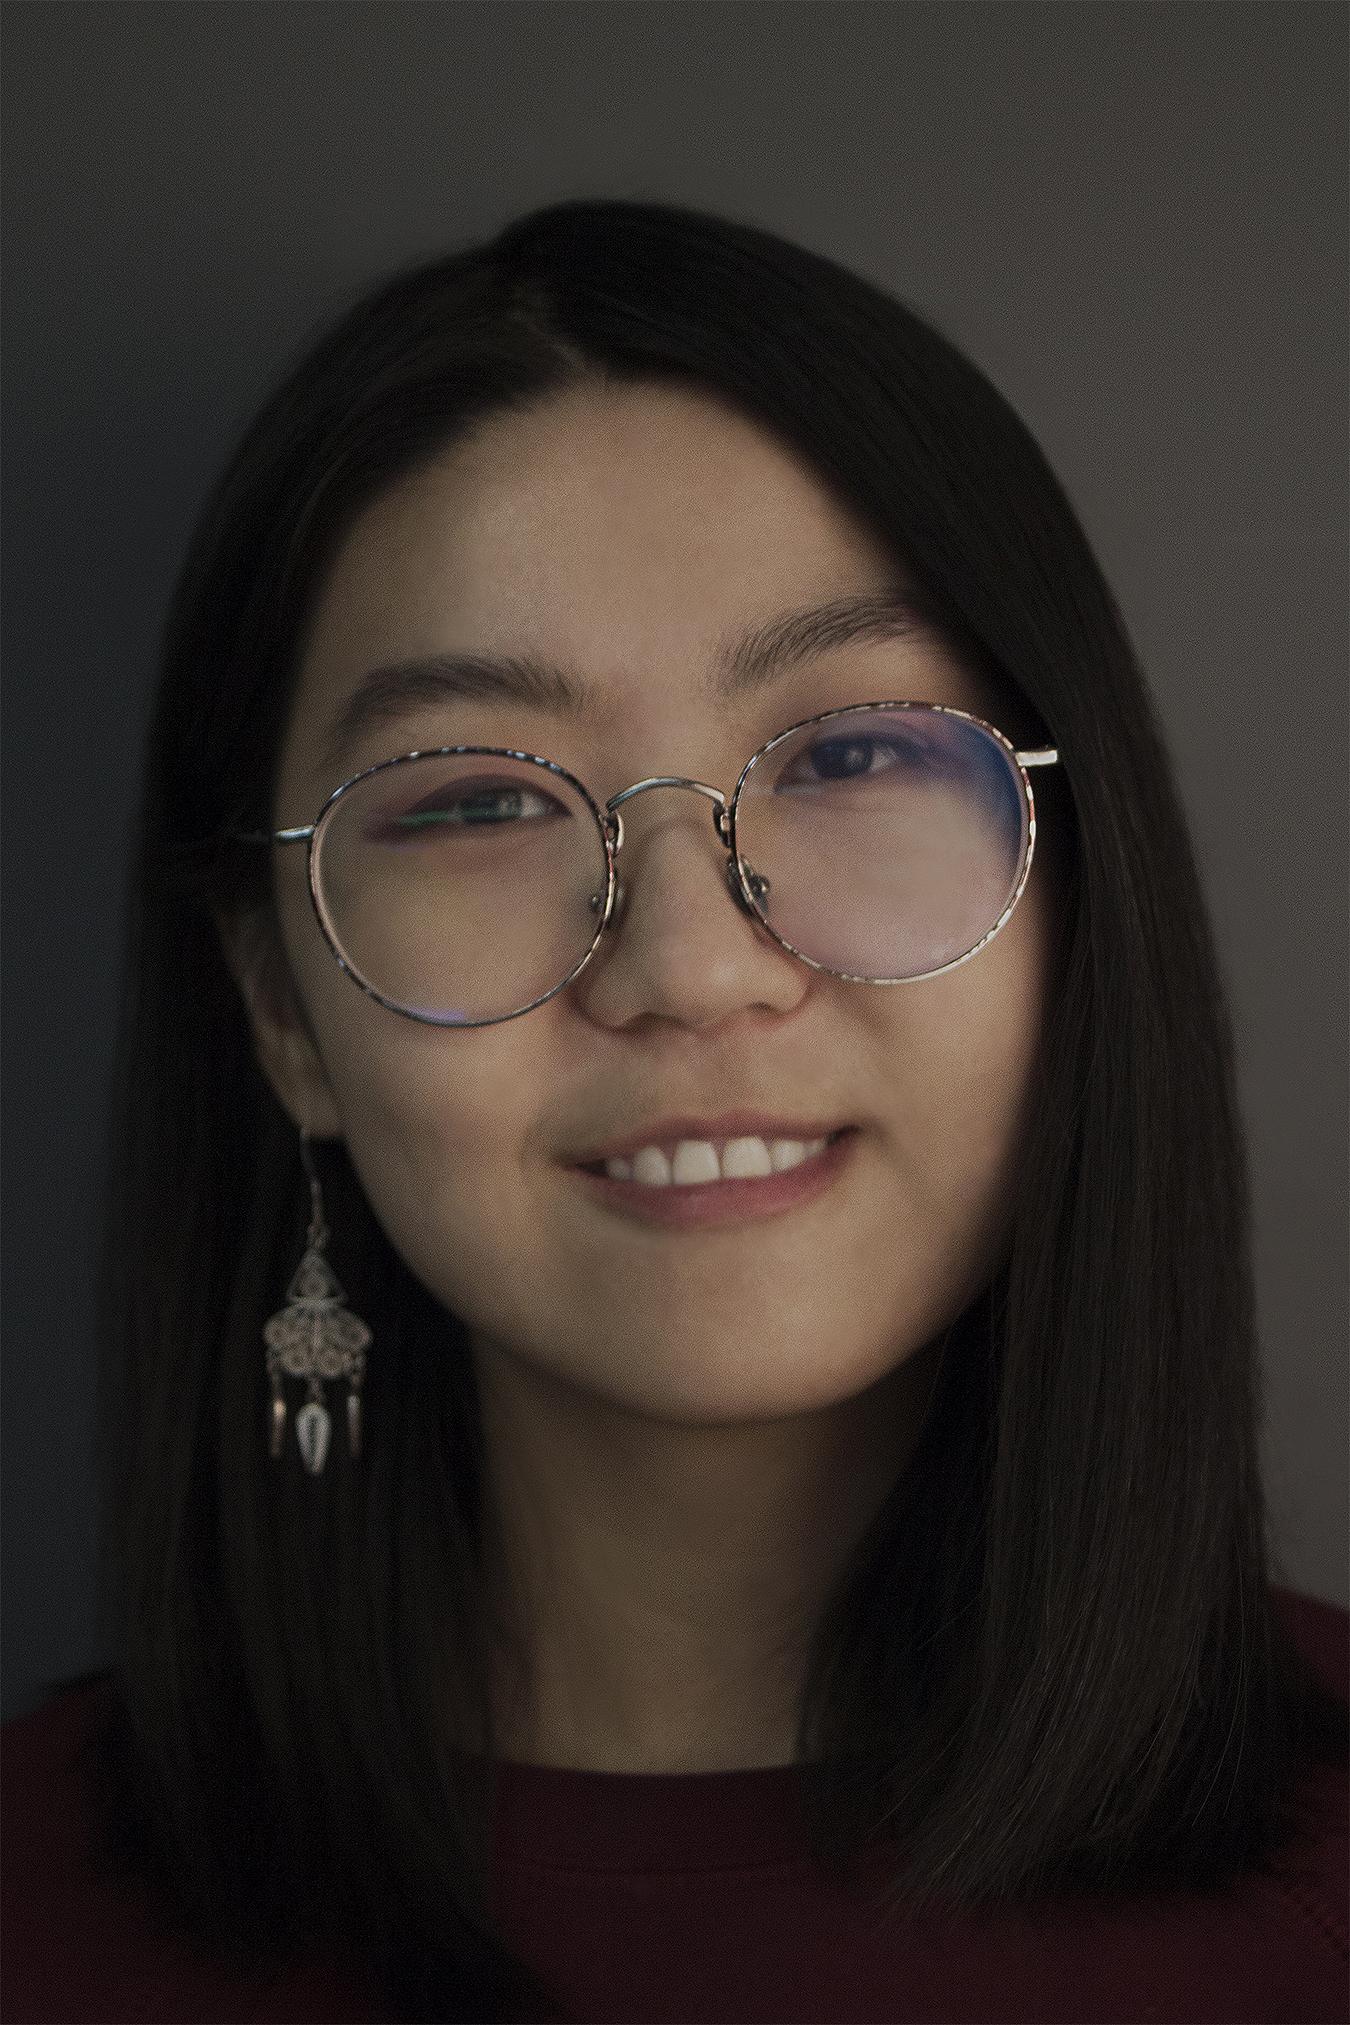 Portrait of Wenjia Guo by Mu Qiao, Copyright 2018